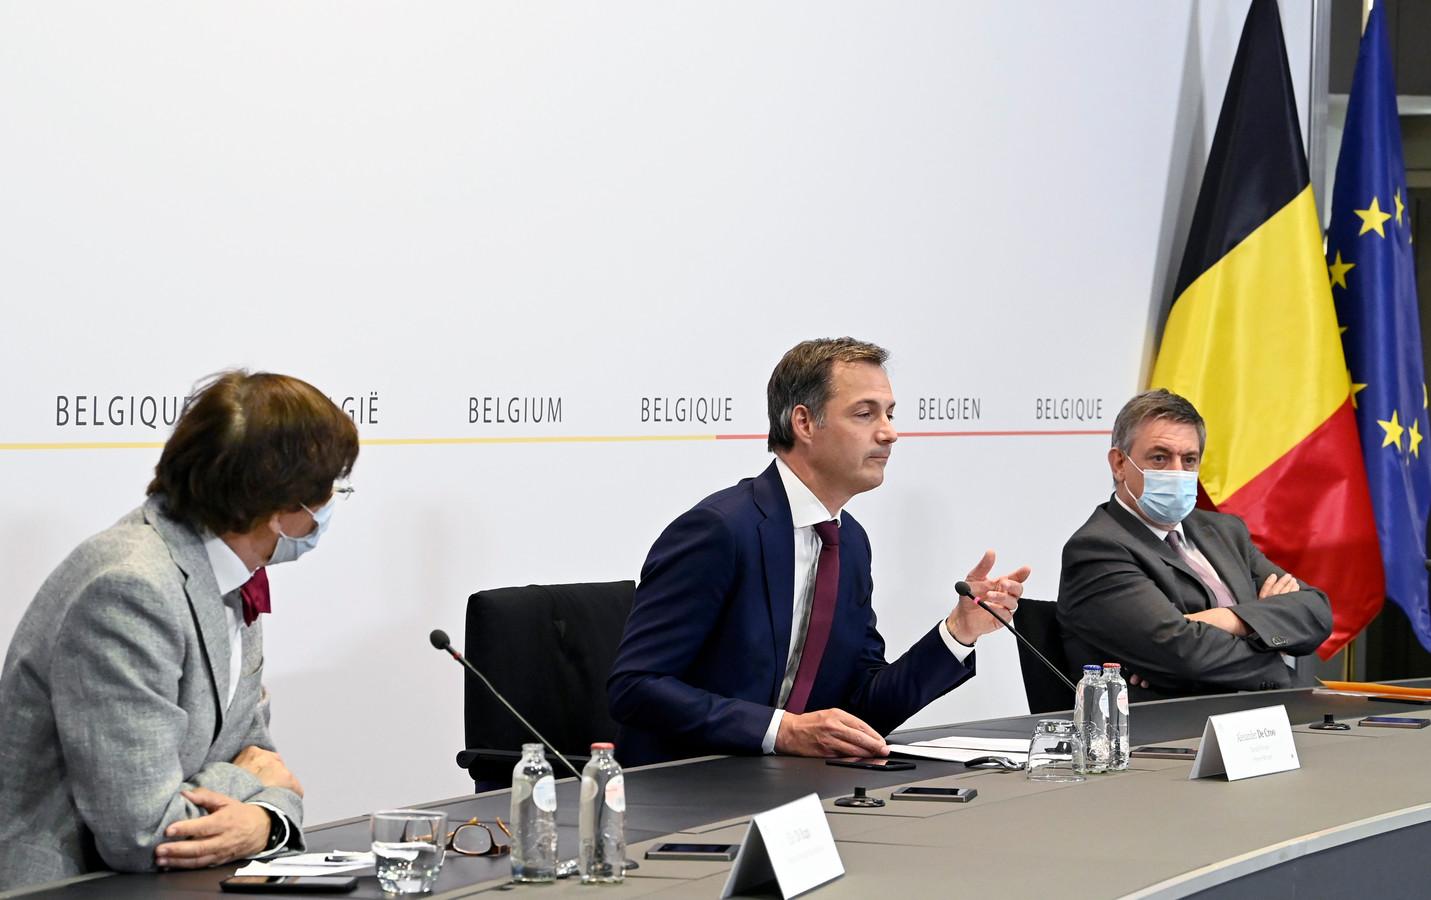 Premier Alexander De Croo (Open Vld, m.) tussen Waals minister-president Elio Di Rupo (PS, l.) en Vlaams minister-president Jan Jambon (N-VA, r.).